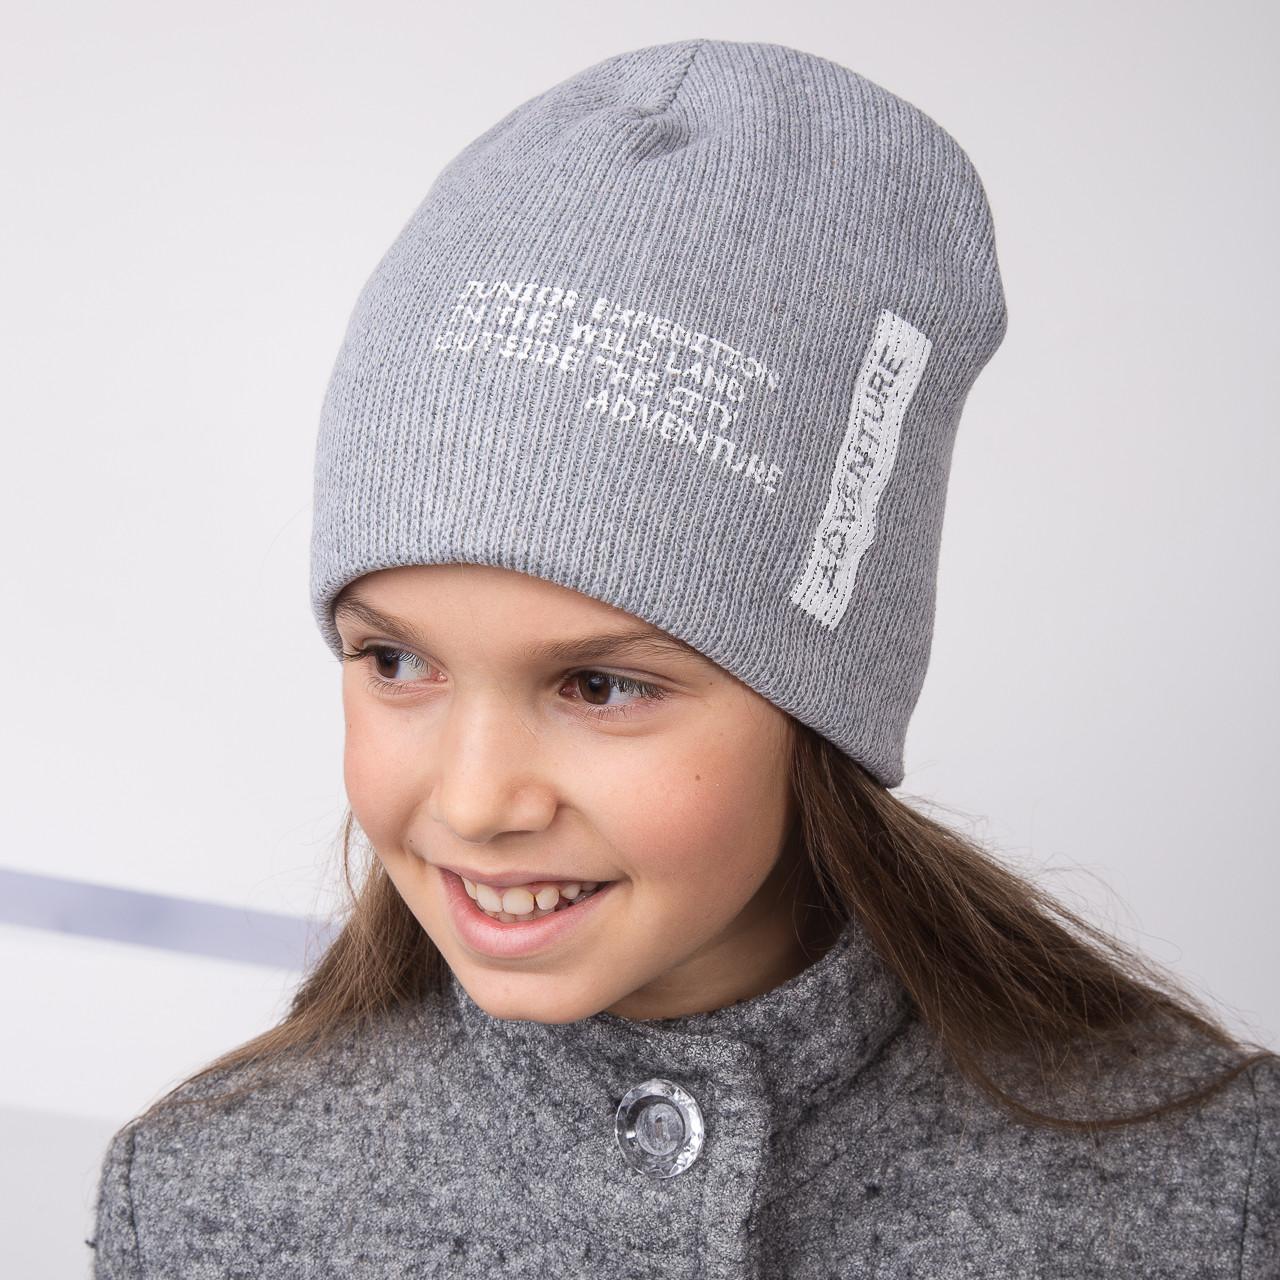 Вязанная зимняя шапка для девочек - Adventure - Артикул 2130